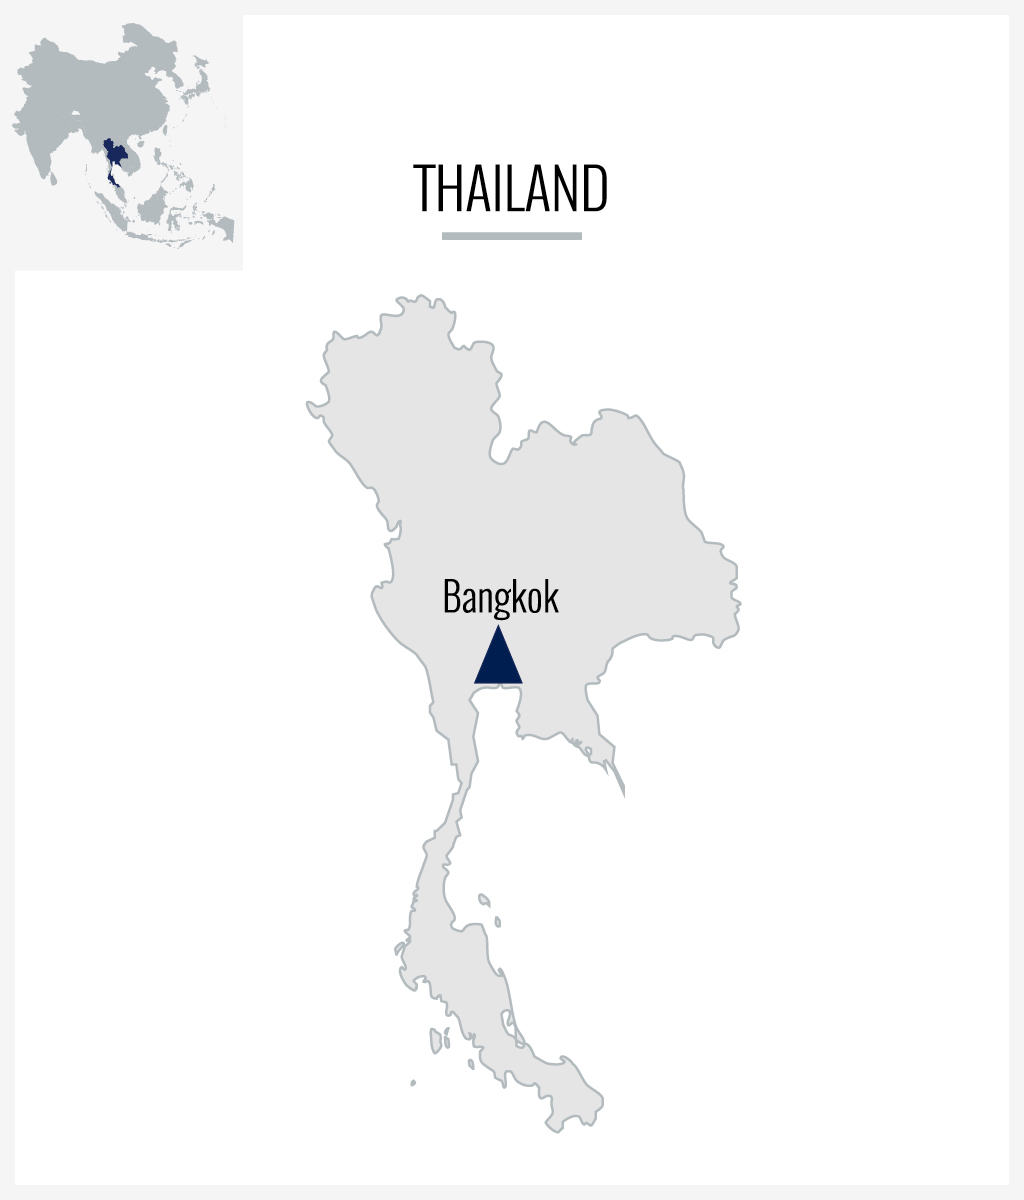 https://amt-sa.com/wp-content/uploads/2019/05/thailand.jpg